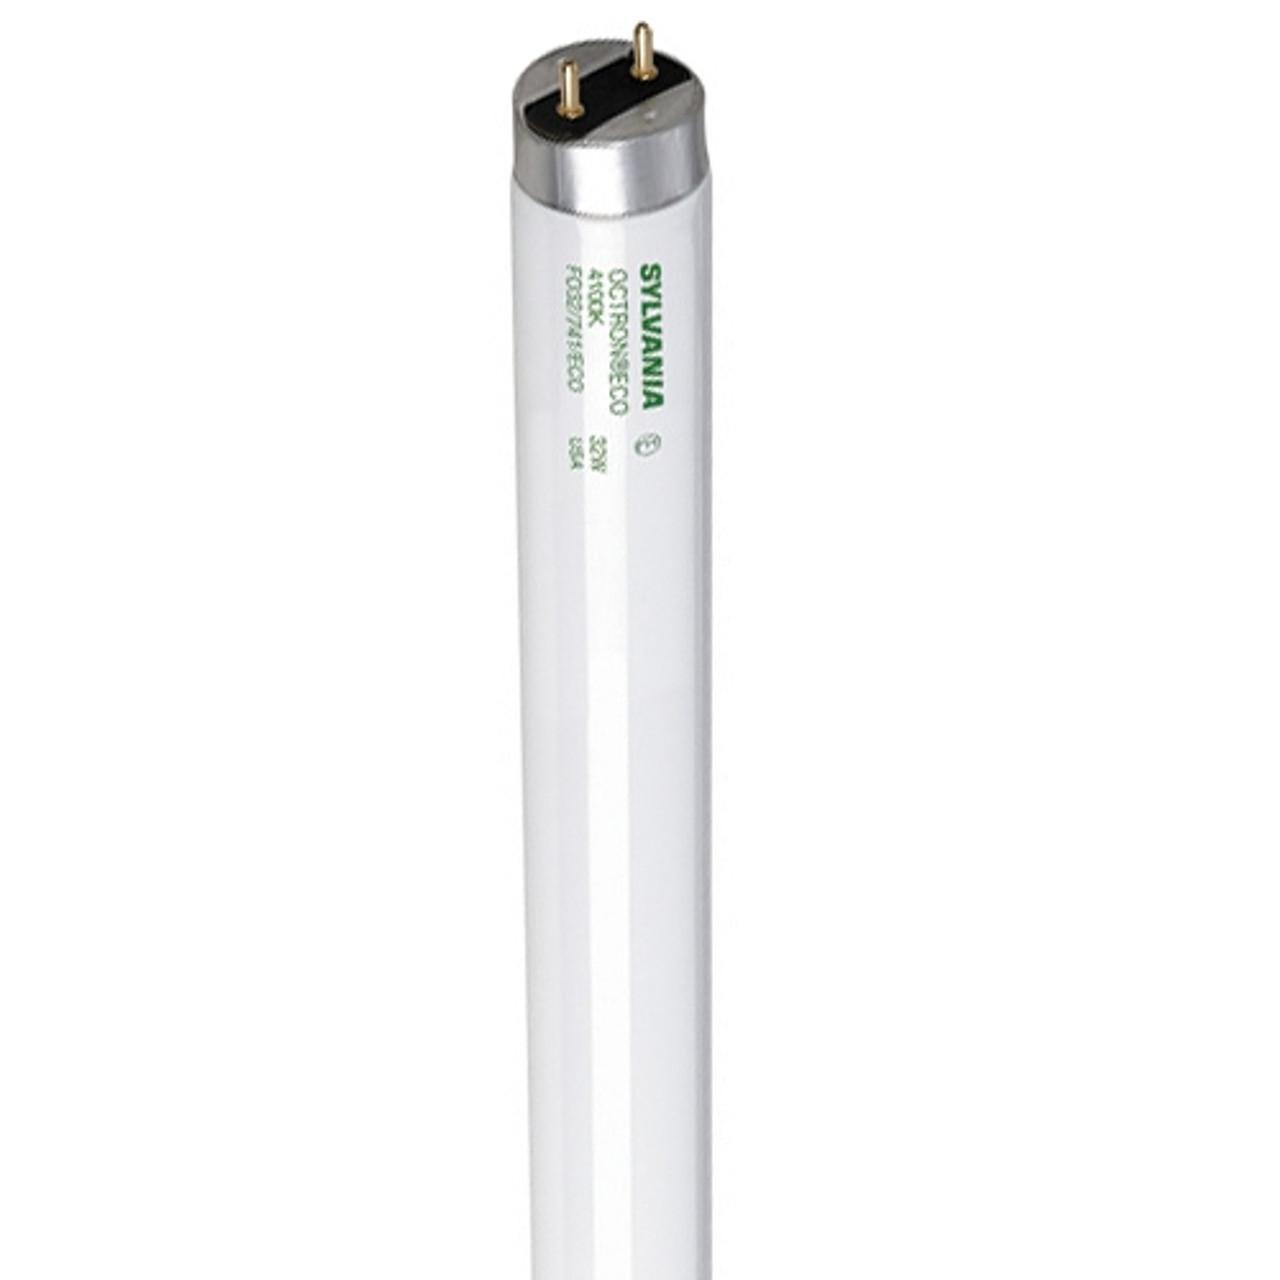 NEW Sylvania F8T5//CW 8W Fluorescent Light Bulb *FREE SHIPPING*